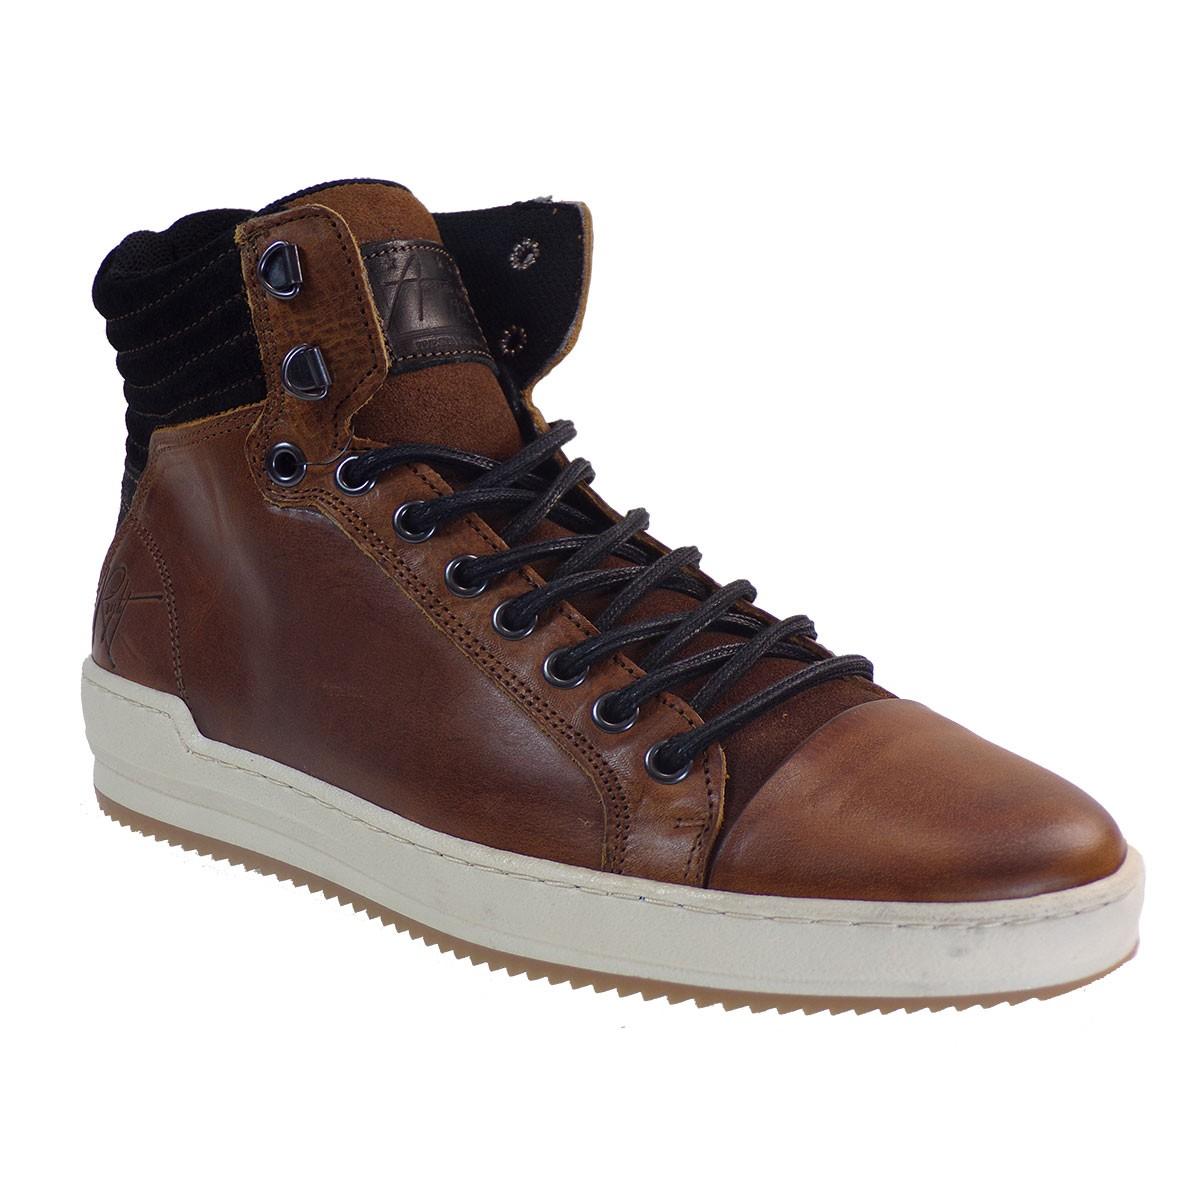 Bullboxer Ανδρικά Παπούτσια Mποτάκια 386-867K558630 Ταμπά Δέρμα J57753862532